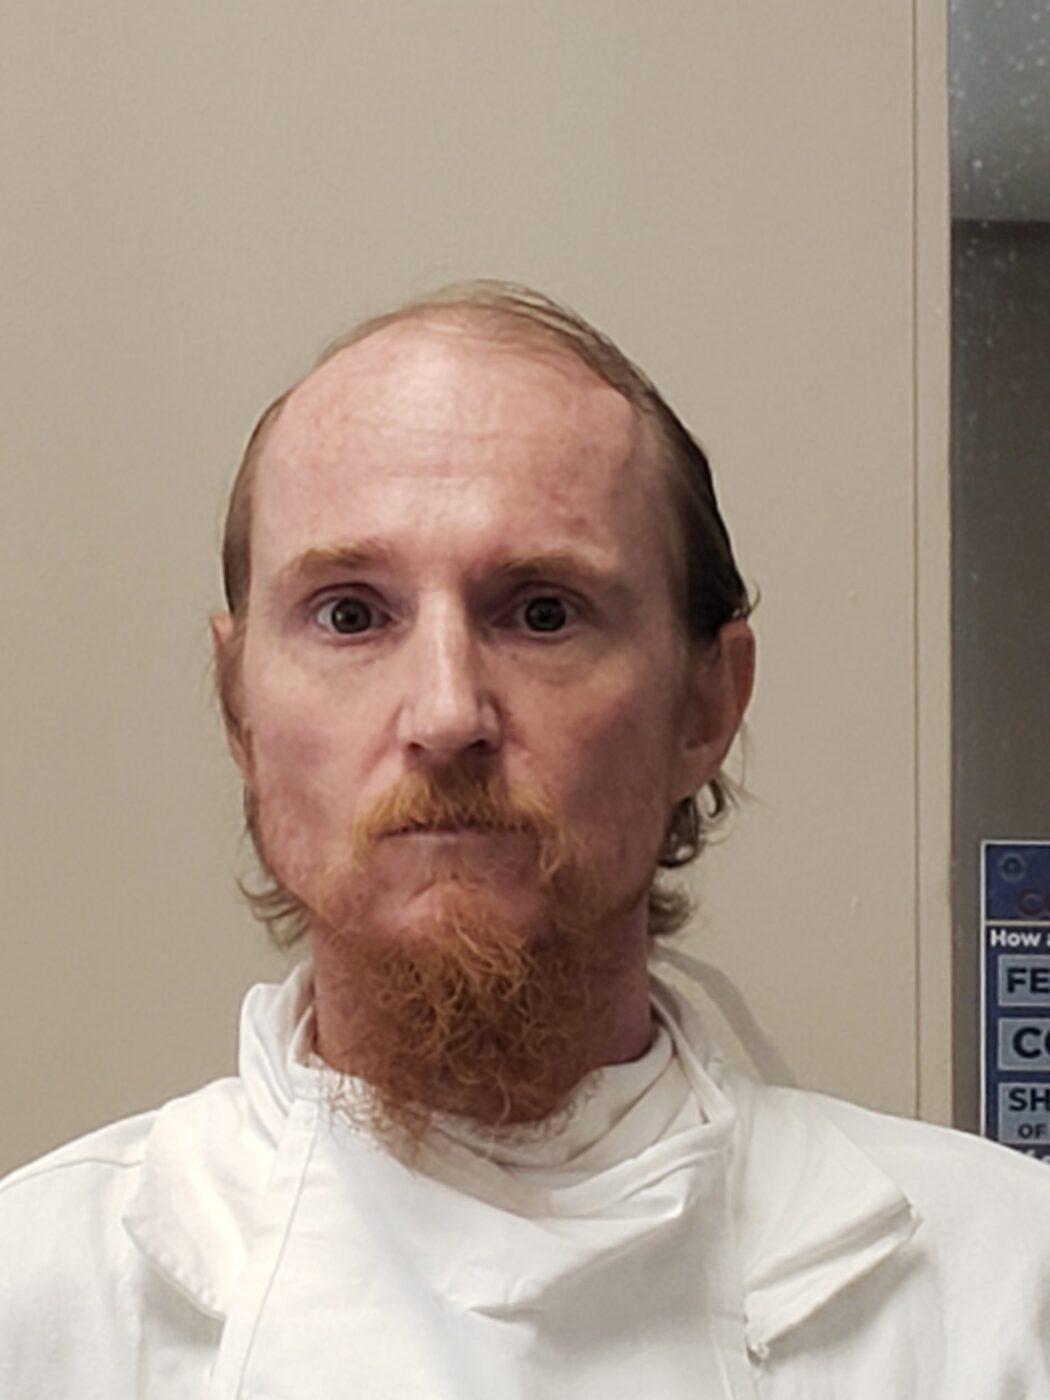 James Earl Watkins Pleads Guilty to 1995 Murder